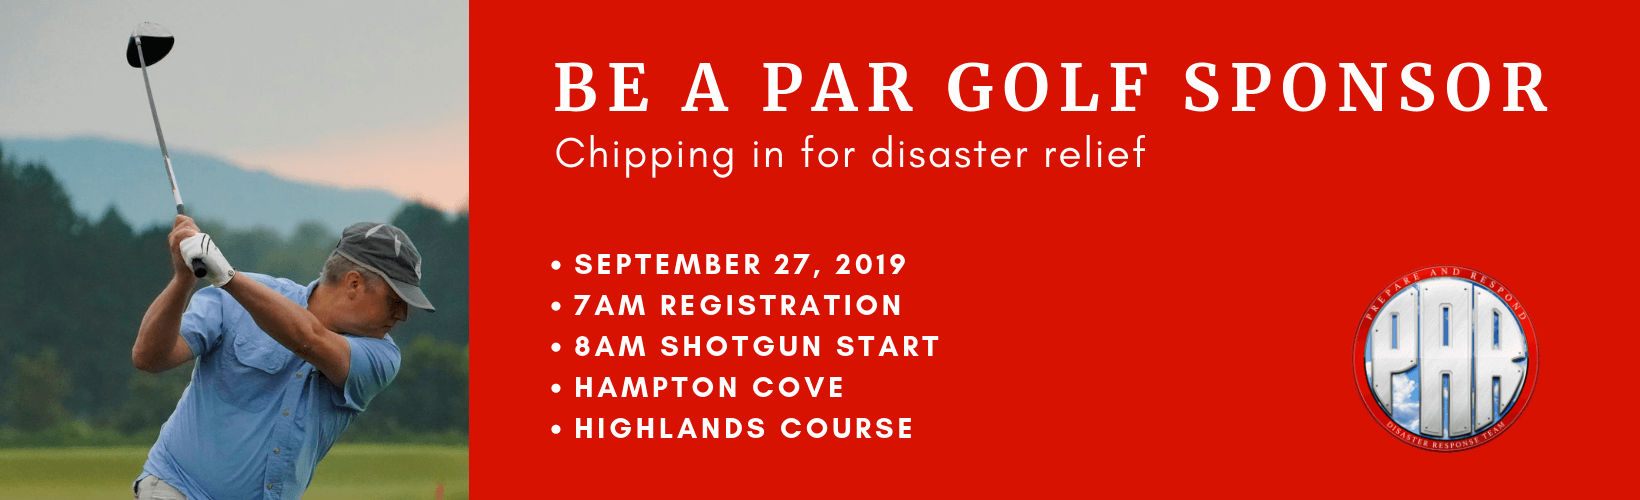 2019 PAR Golf Sponsor_header